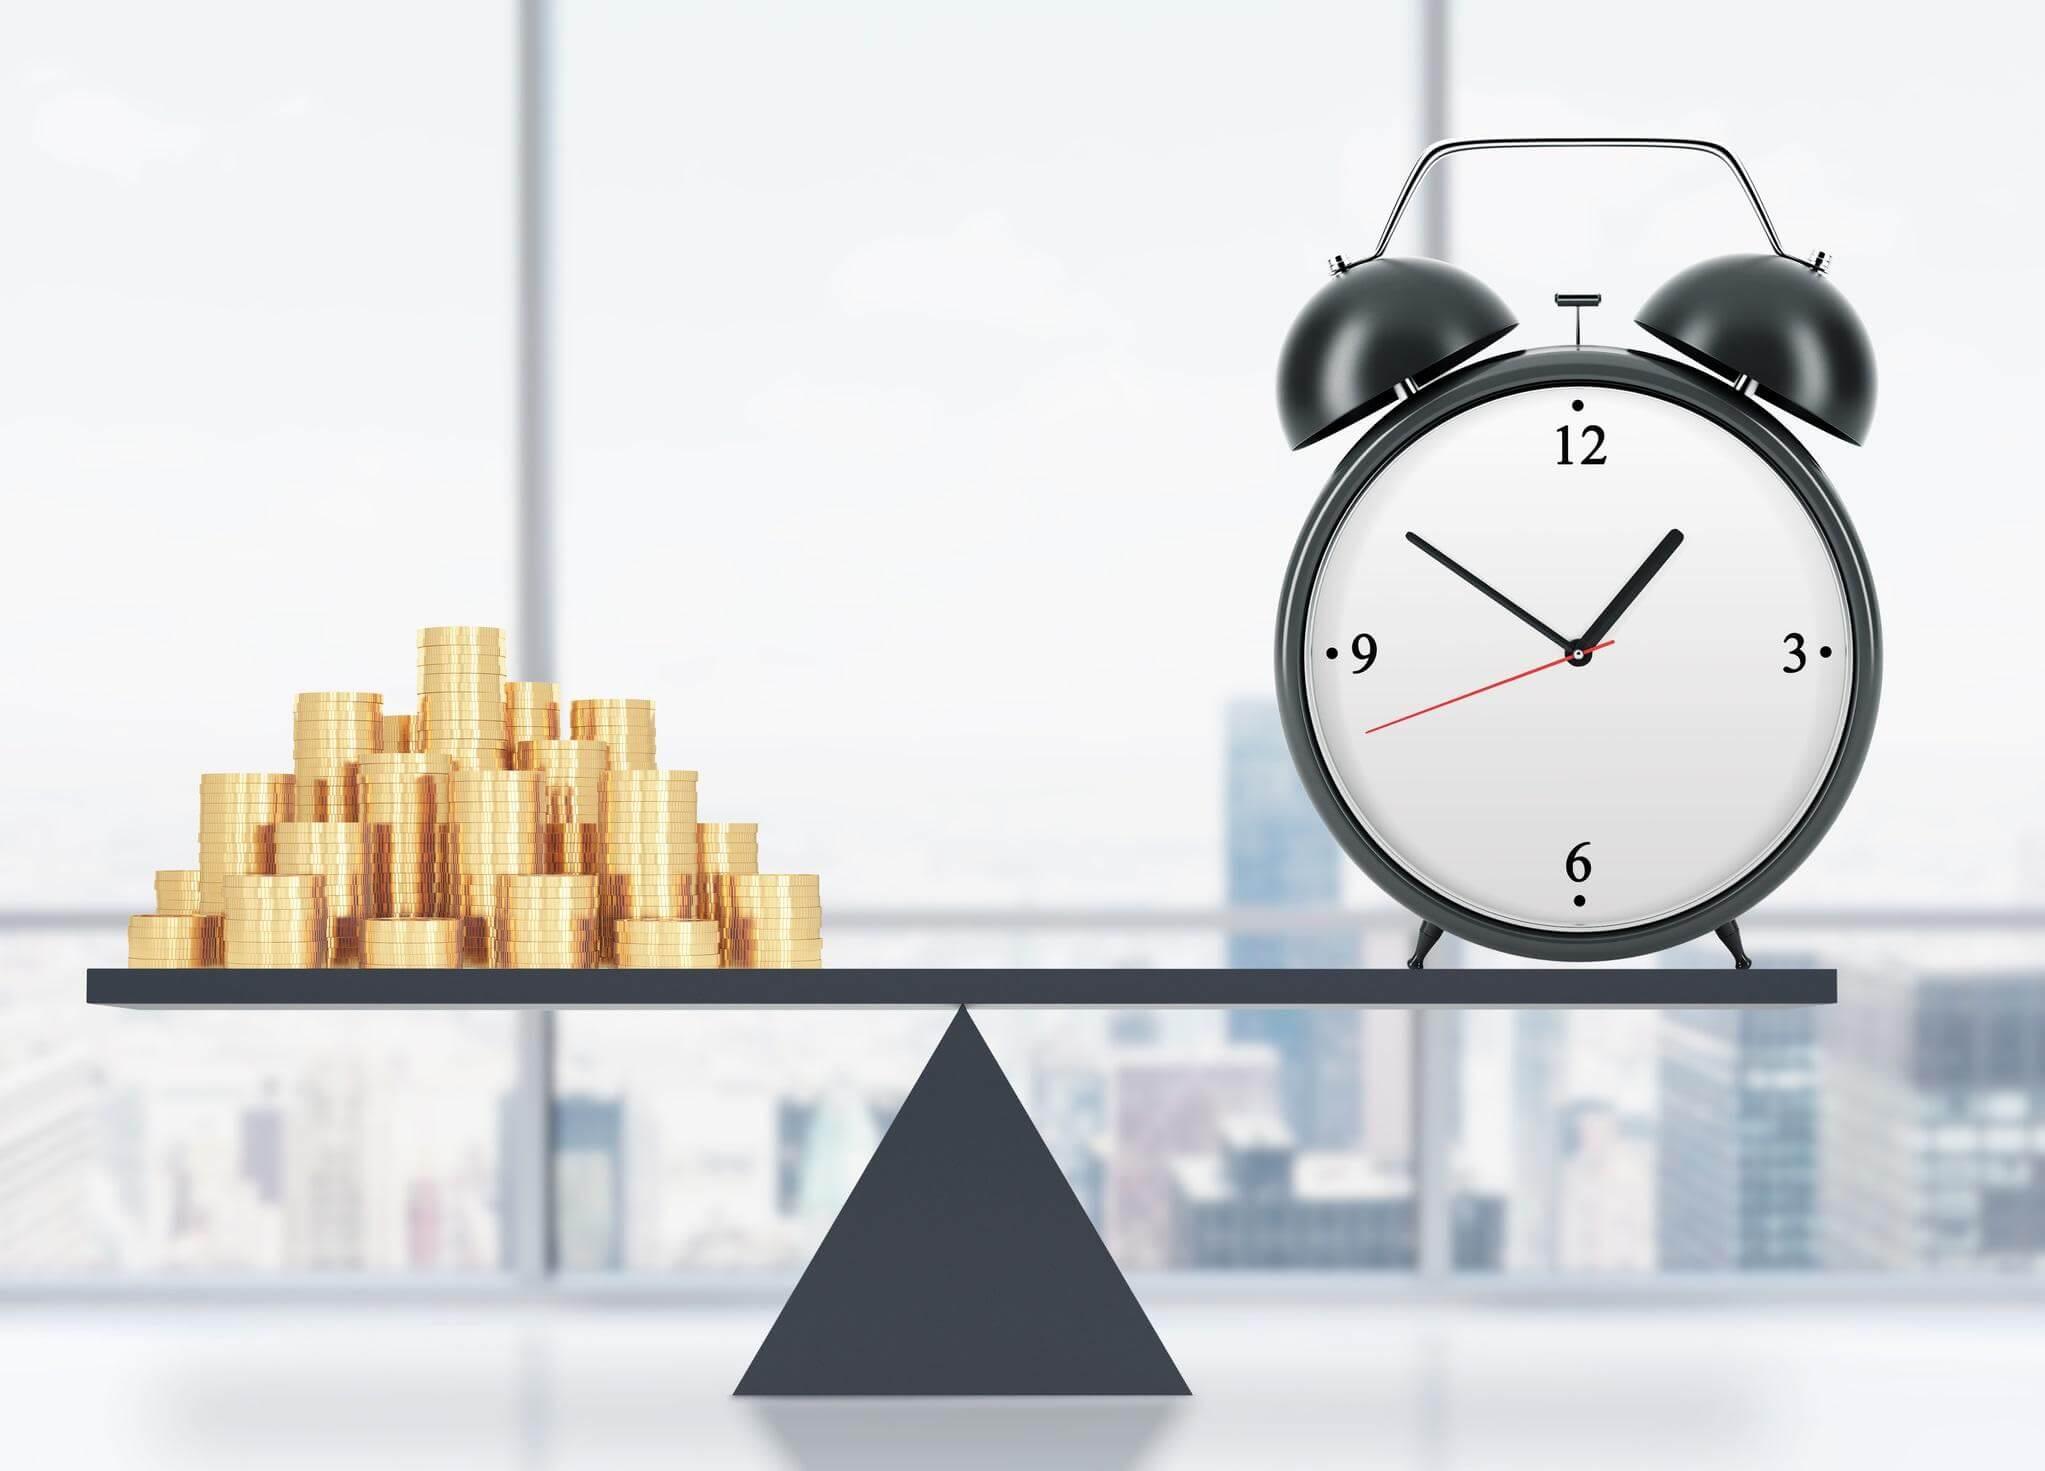 Earned value management principles